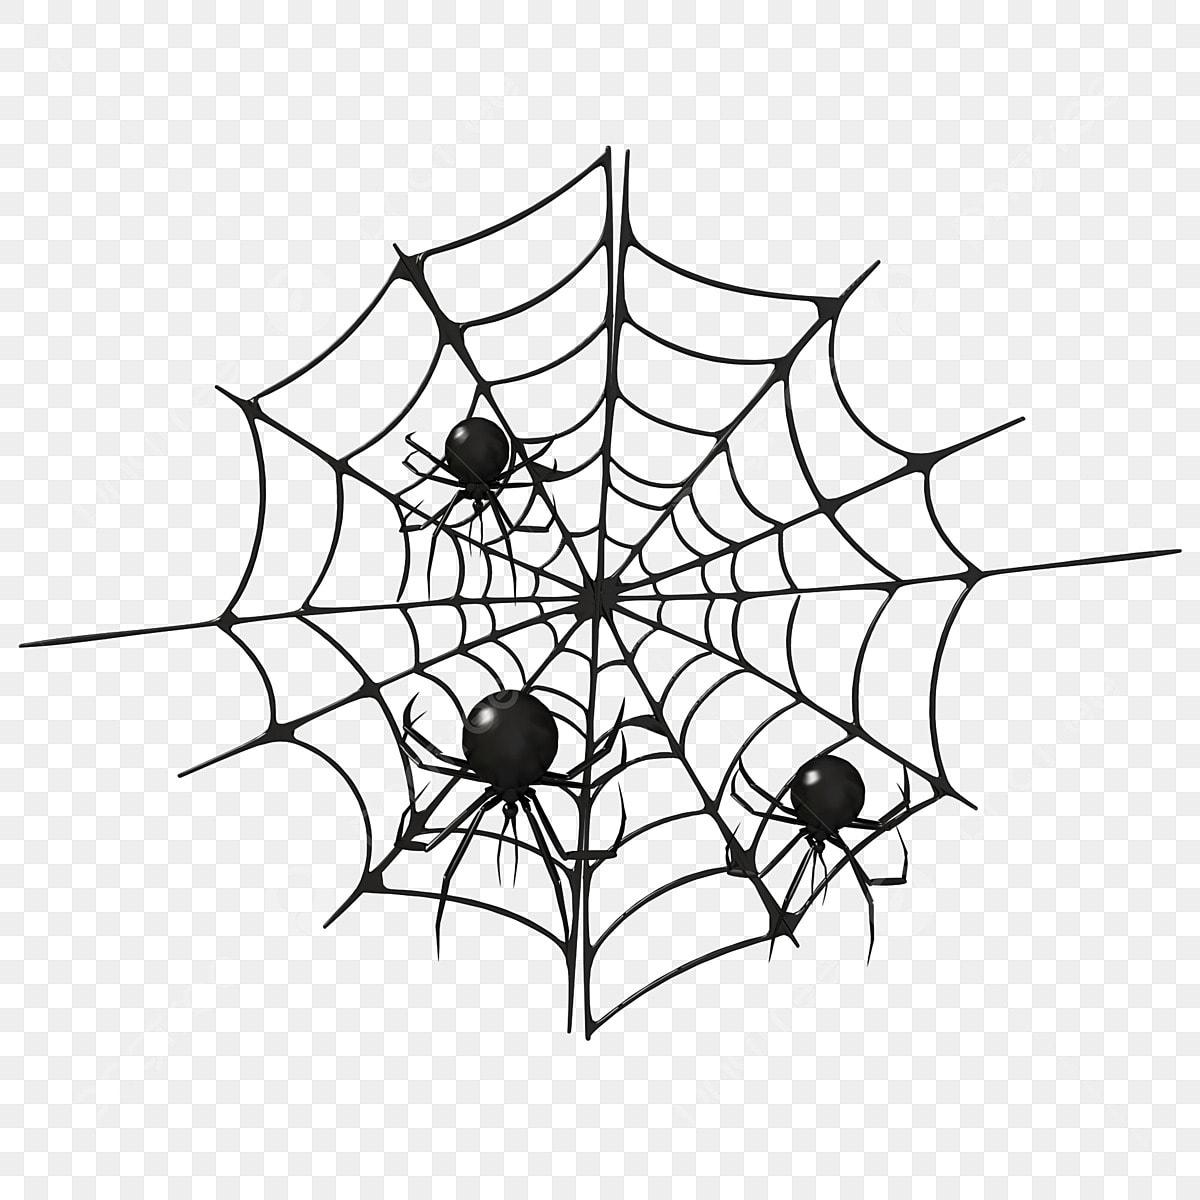 Halloween C4d Dessin Animé Toile Daraignée Noire Araignée